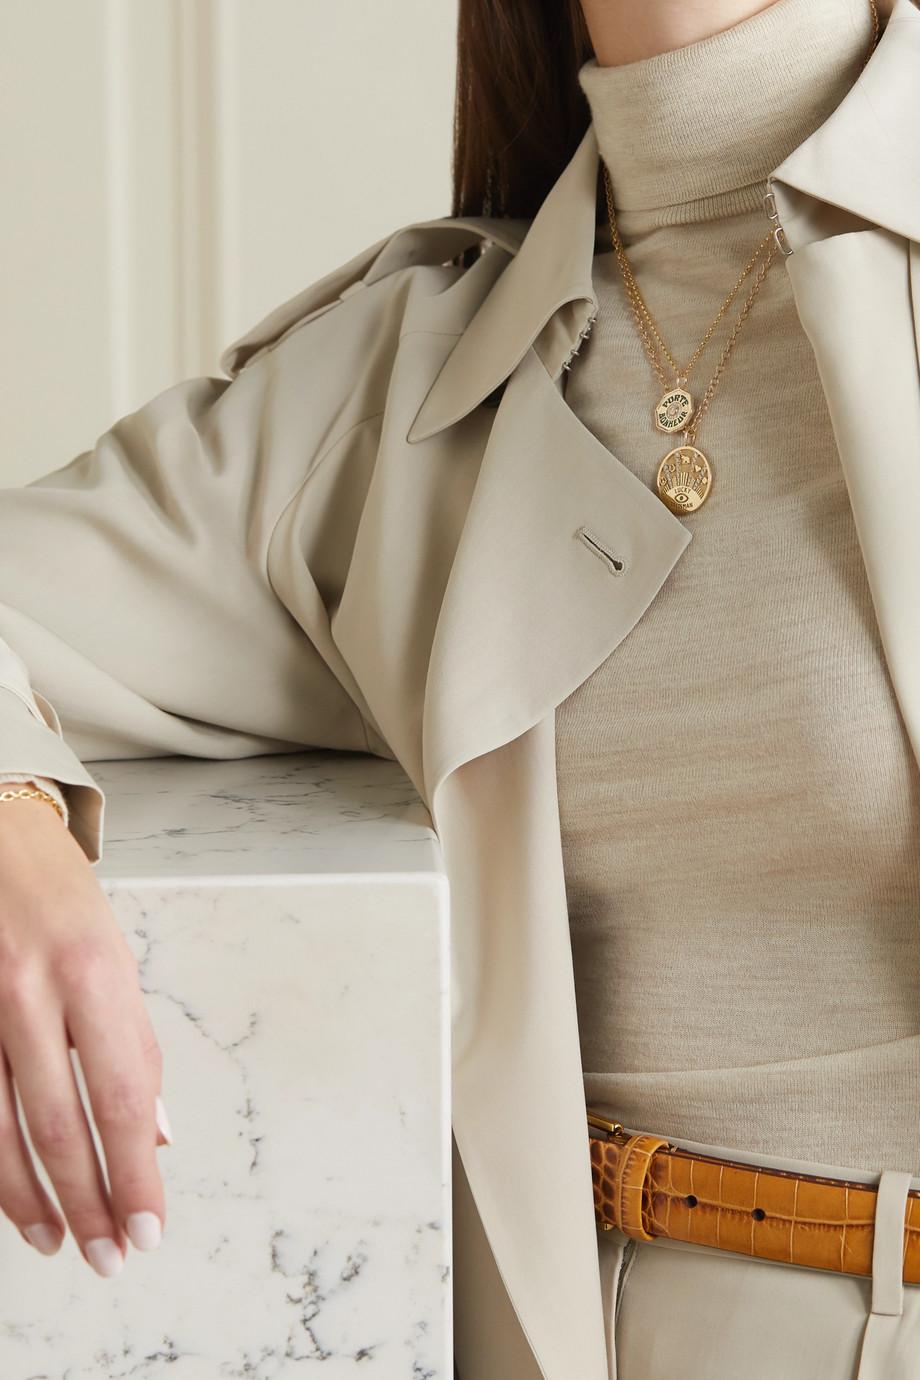 Marlo Laz Mini Porte Bonheur Coin 14-karat gold, enamel and diamond necklace